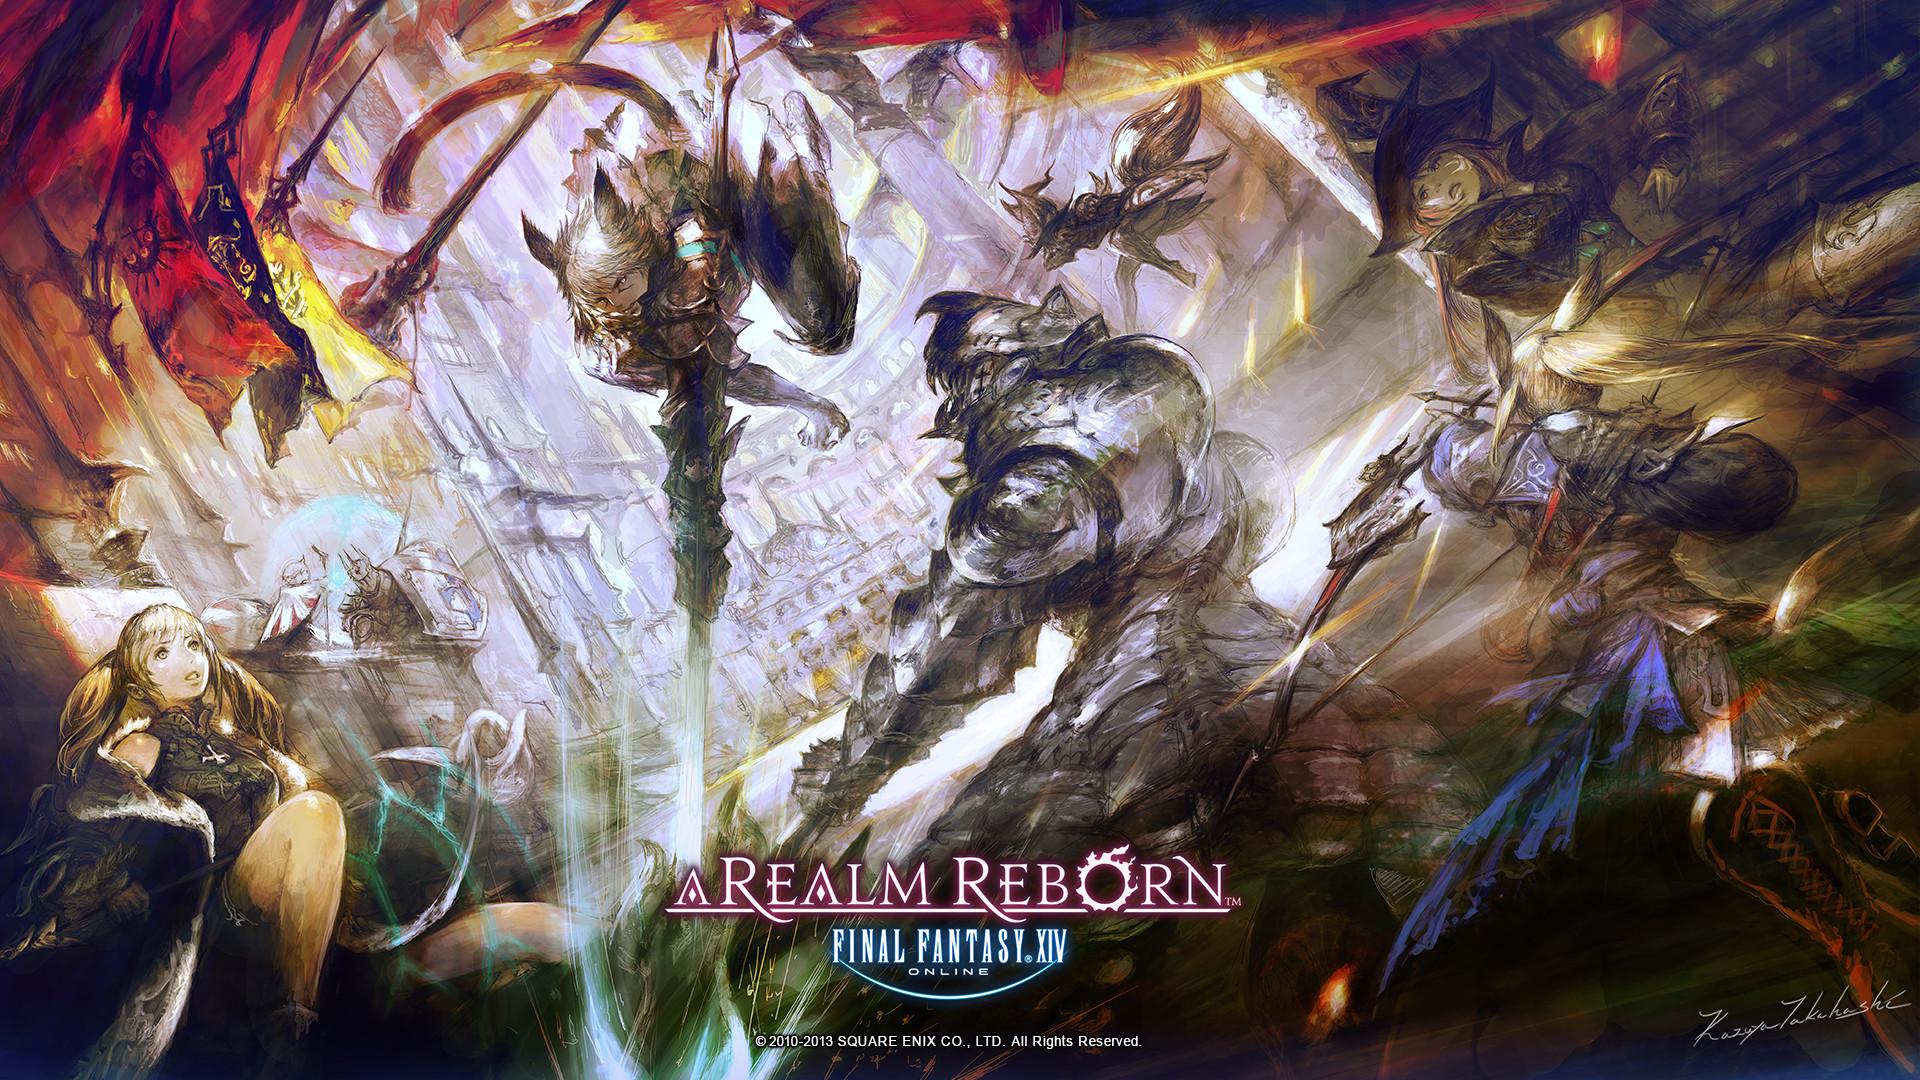 Final Fantasy XIV A Realm Reborn Wallpapers Jogos Online